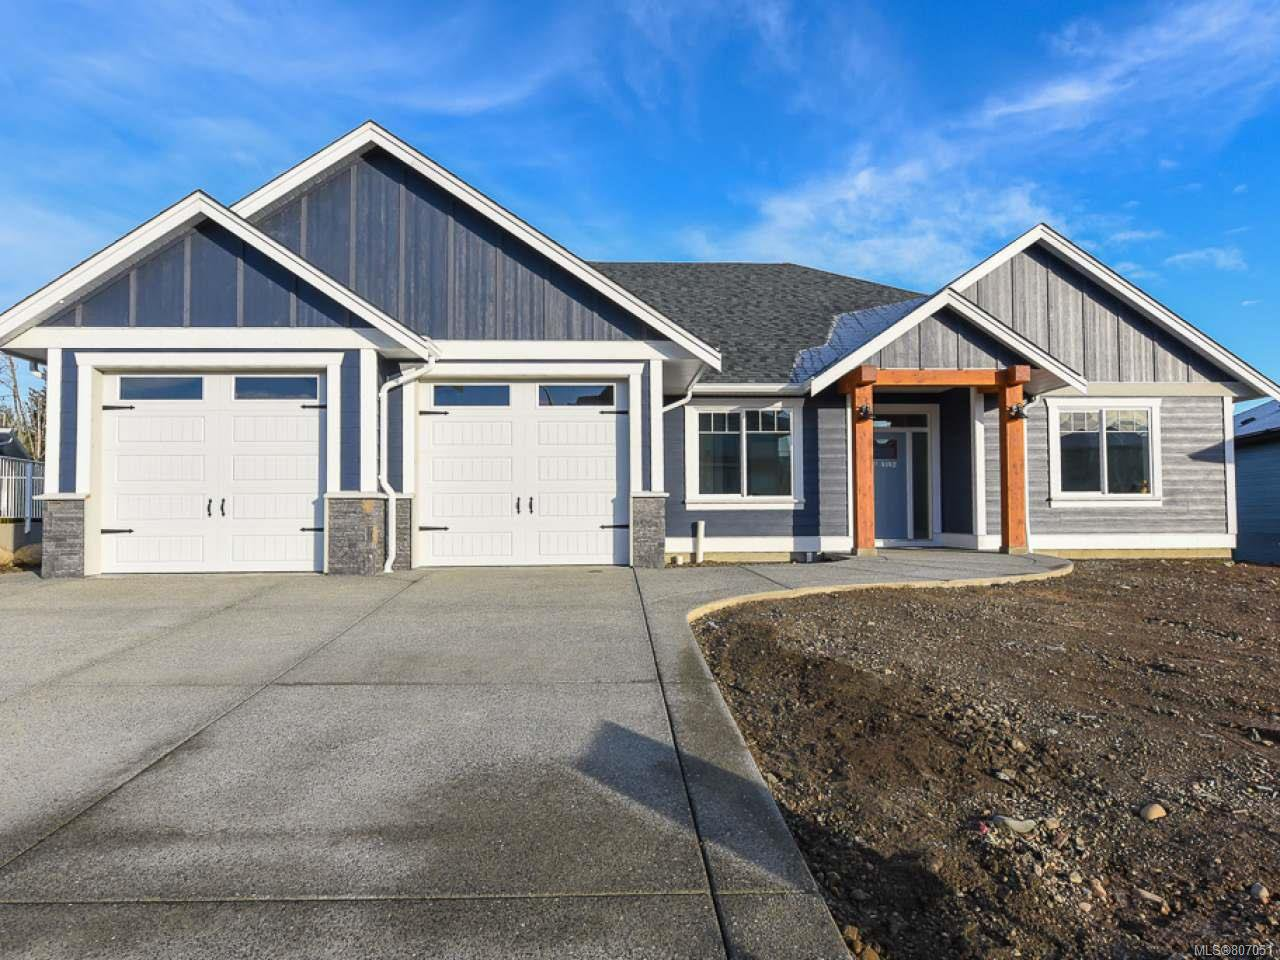 Main Photo: 4142 Chancellor Cres in COURTENAY: CV Courtenay City House for sale (Comox Valley)  : MLS®# 807051